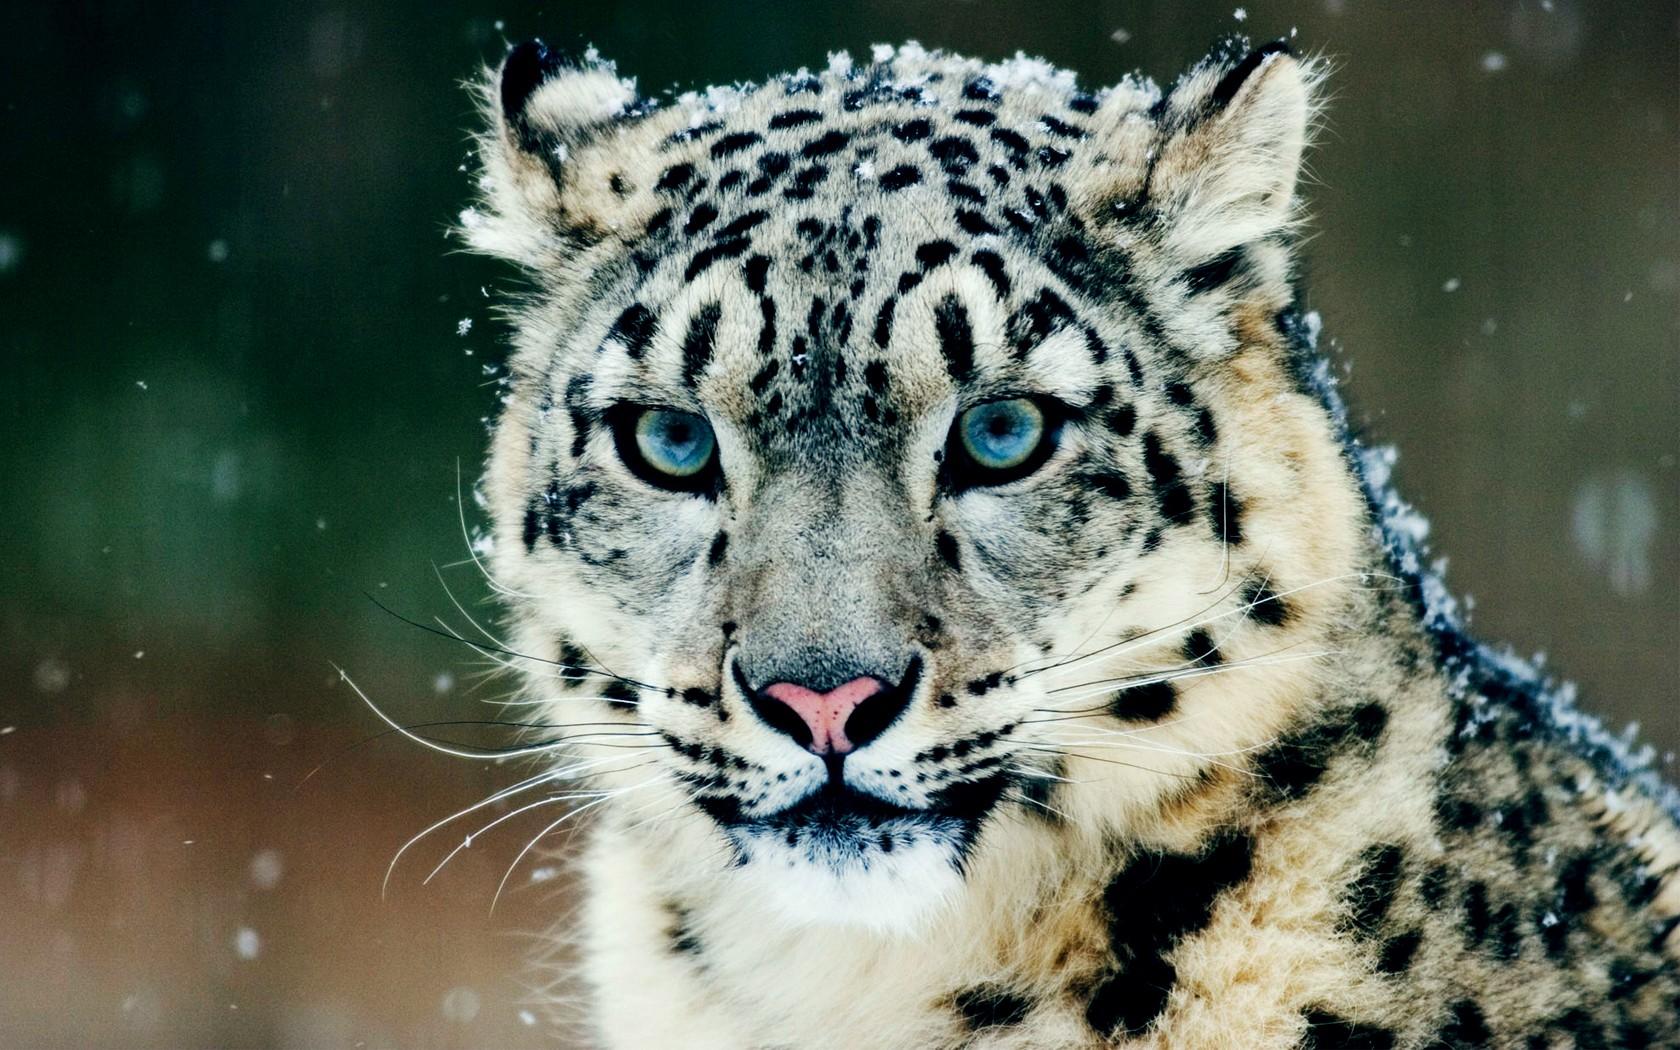 Wallpaper Harimau Margasatwa Kucing Besar Cambang Macan Tulul